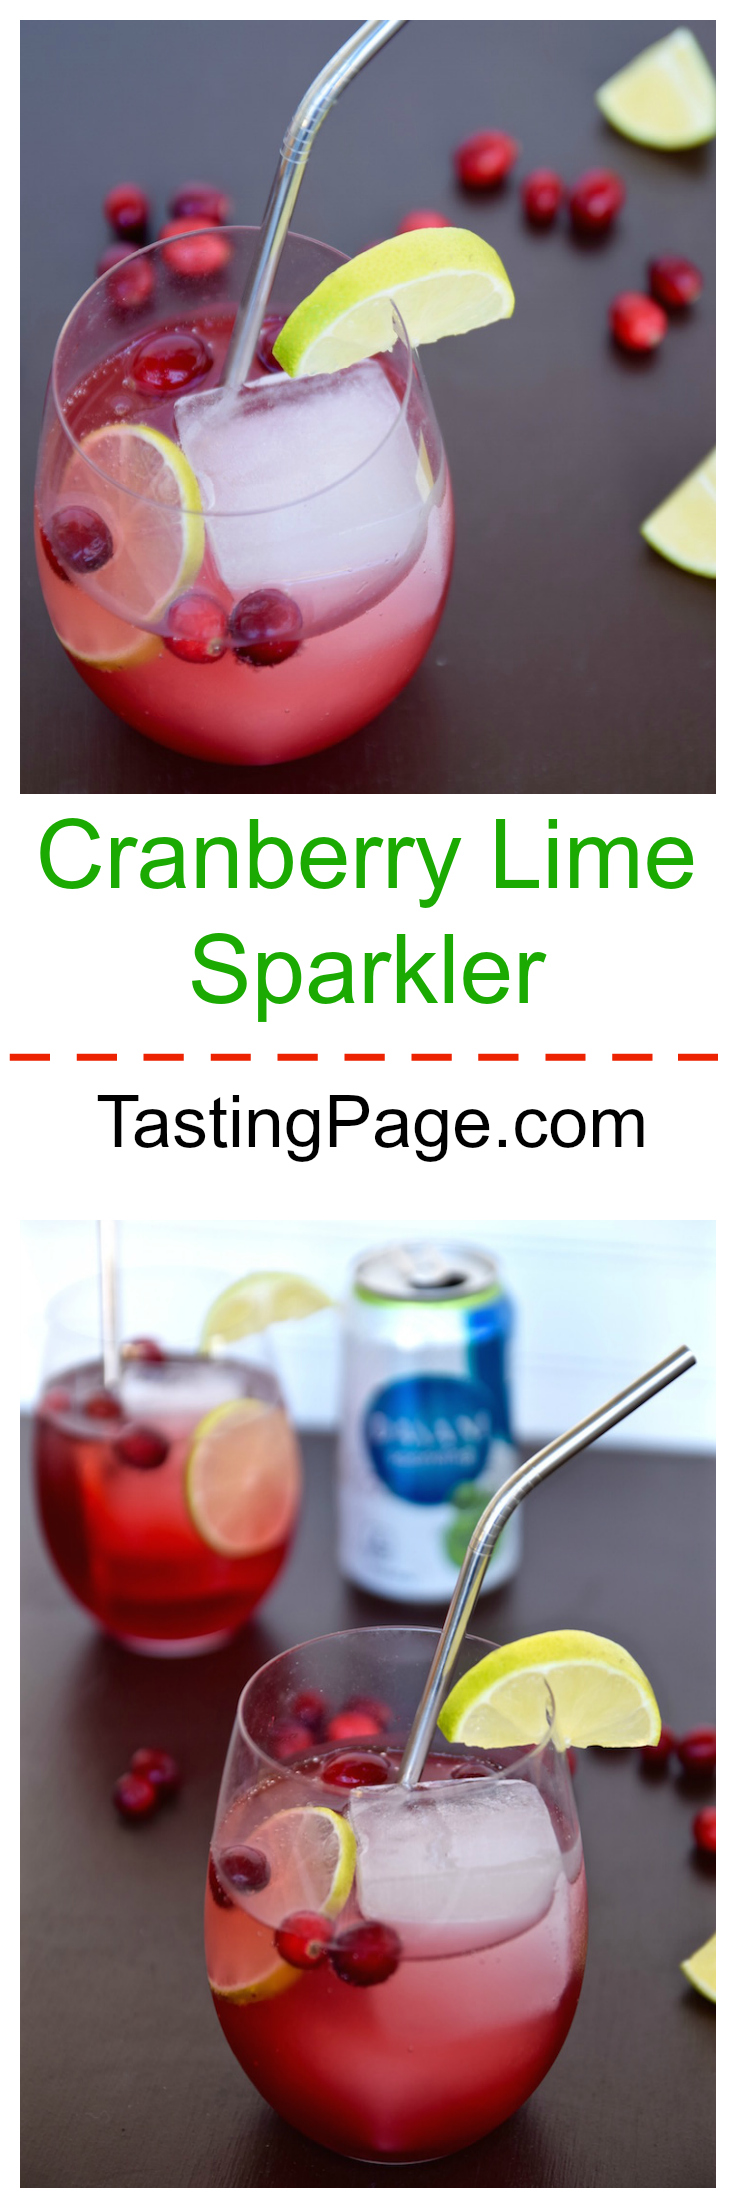 Cranberry Lime Holiday Sparkler | TastingPage.com